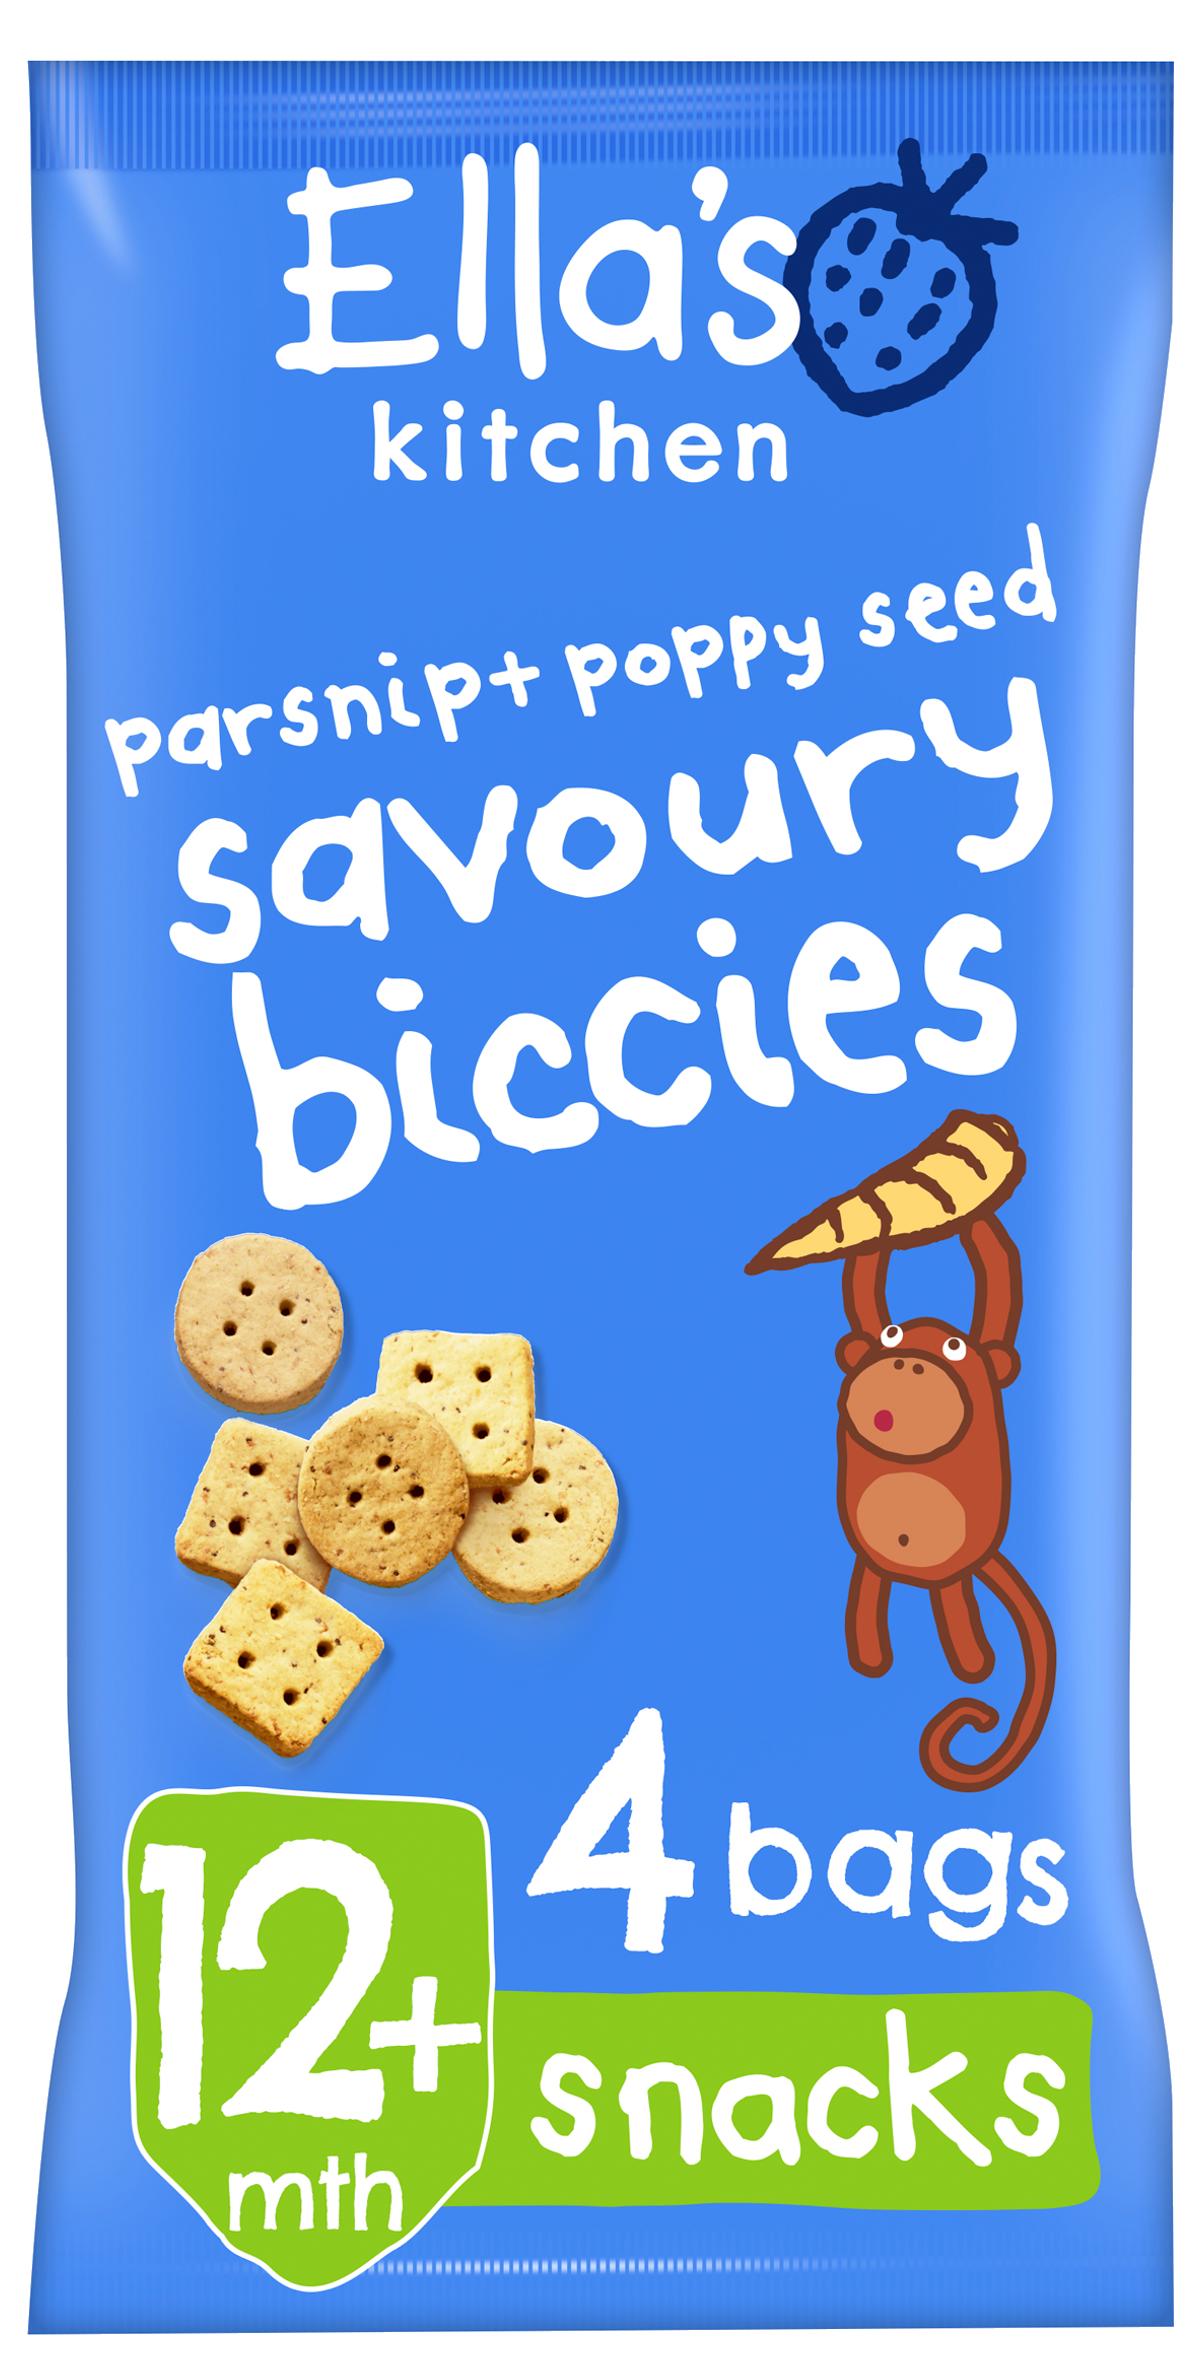 Ellas kitchen savoury biccies parsnip poppyseed bag front of pack O 3